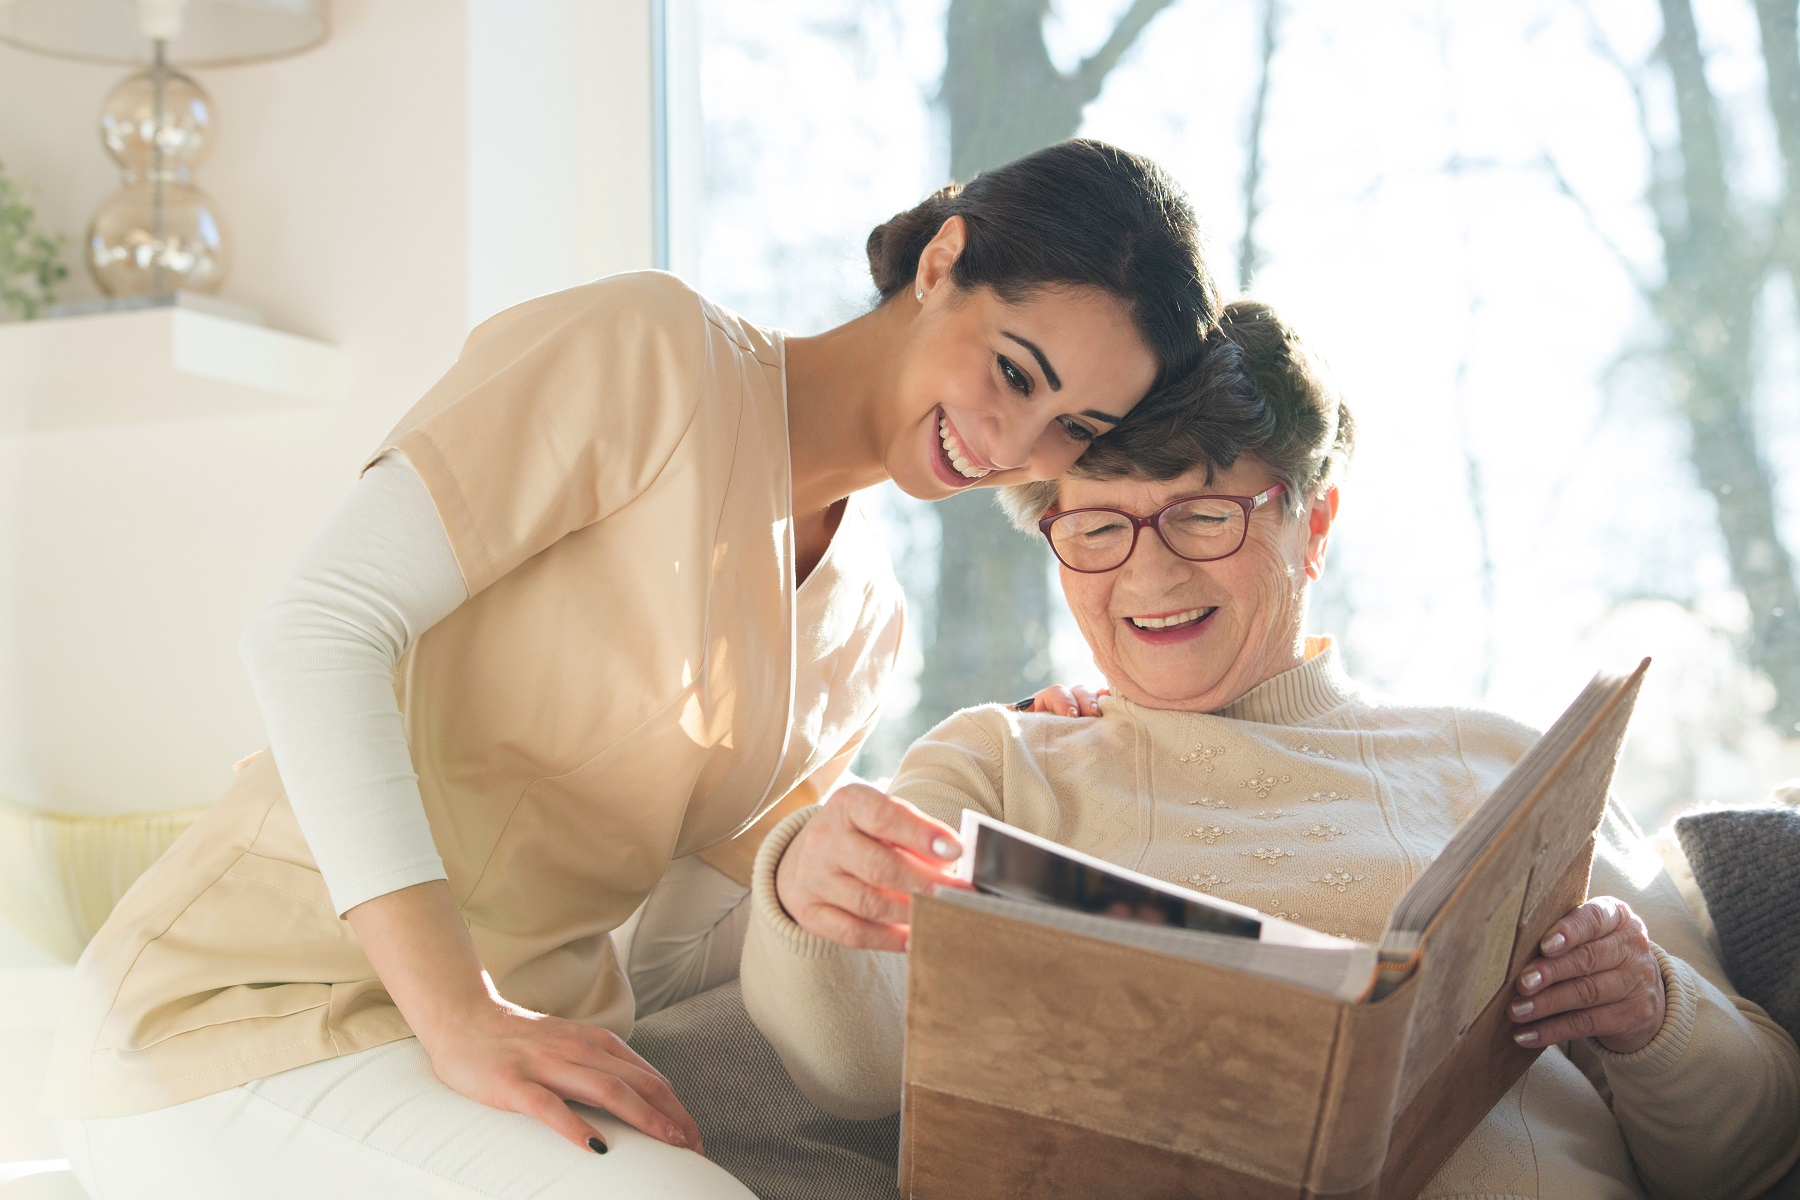 Memory care team member and senior resident looking at photo album